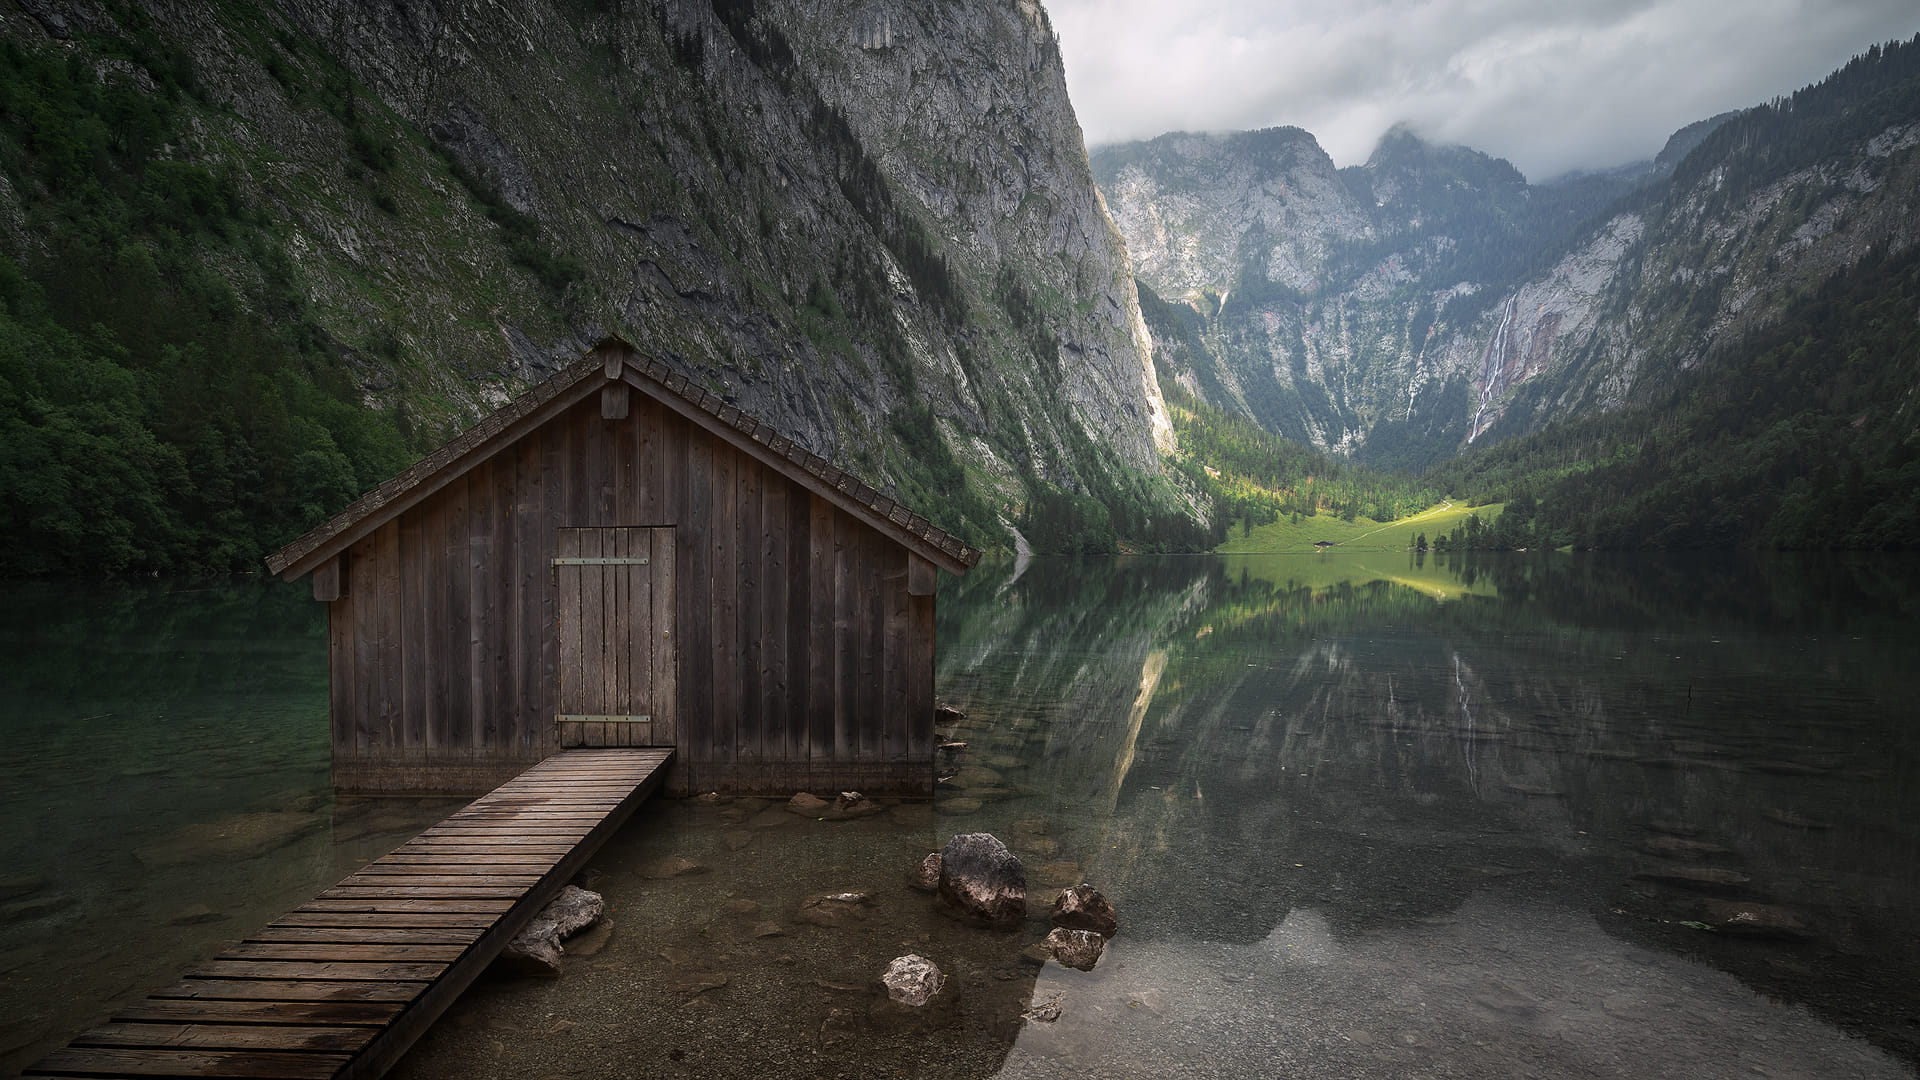 The littel boat-house